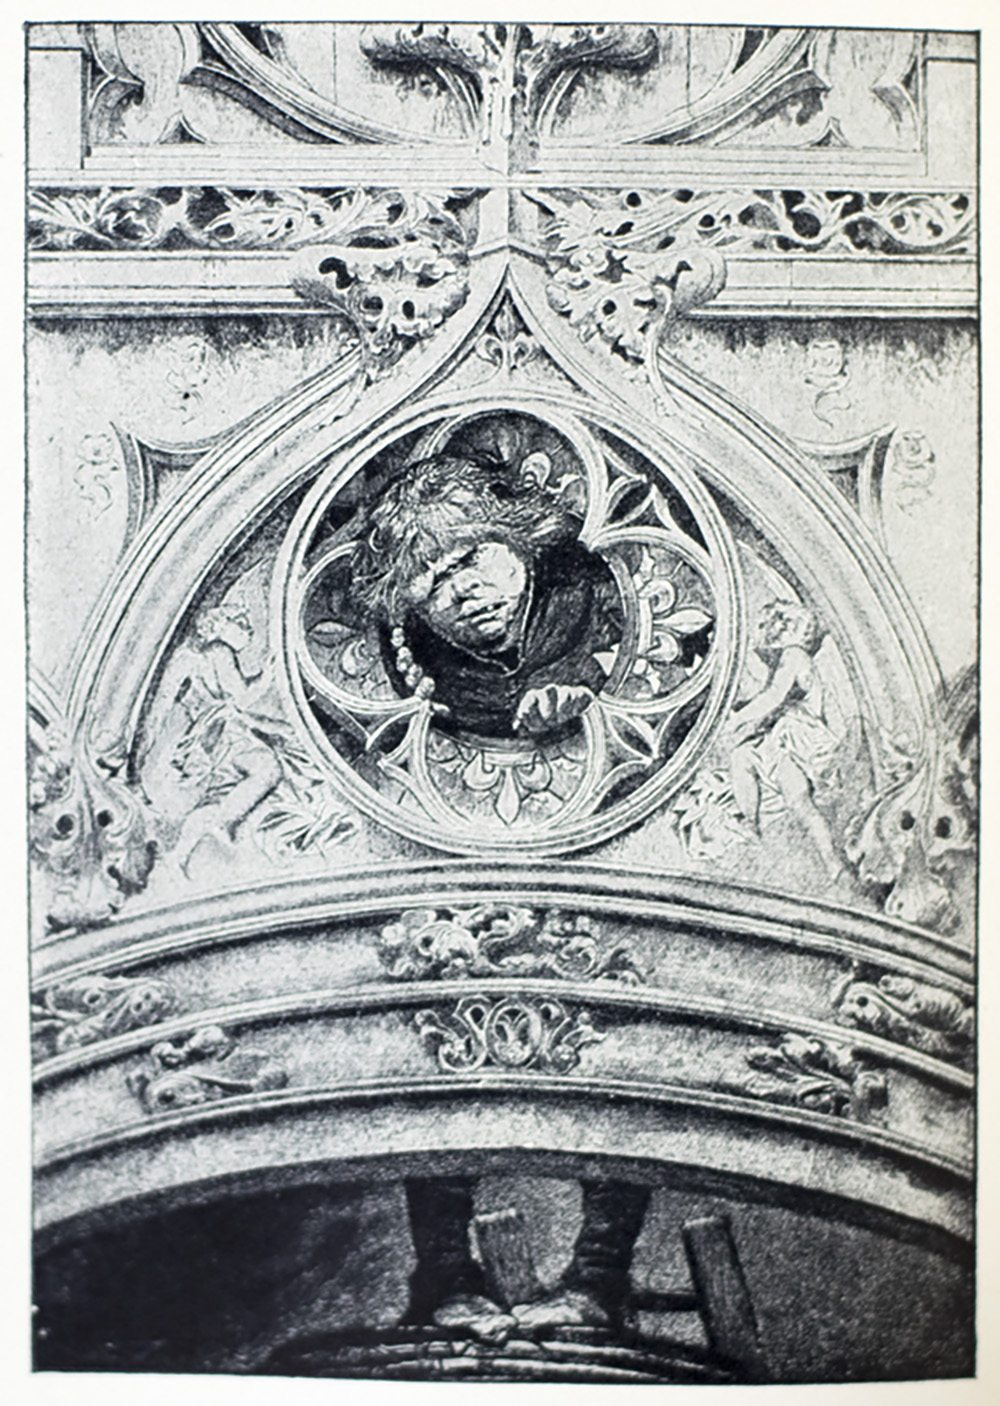 The Works of Victor Hugo Includes Les Misérables, The Hunchback of Notre-Dame.